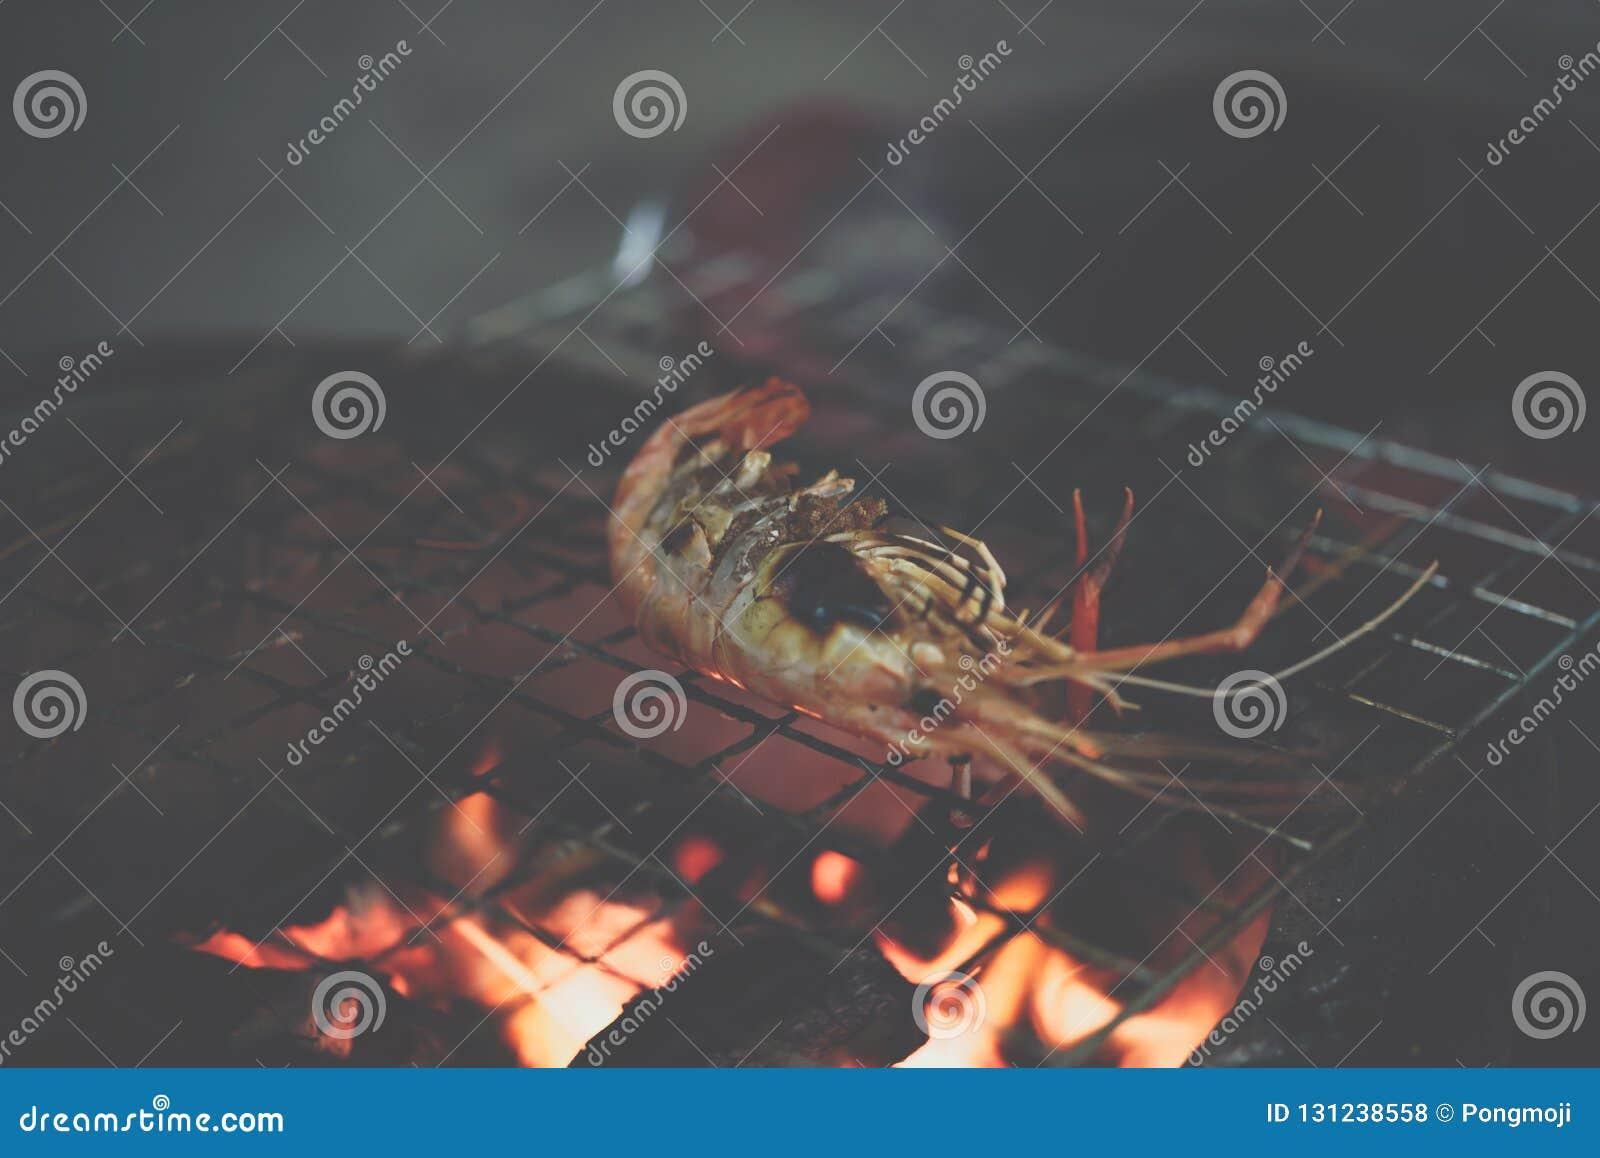 Grilled Shrimp (Giant Freshwater Prawn) At Market Stock Photo